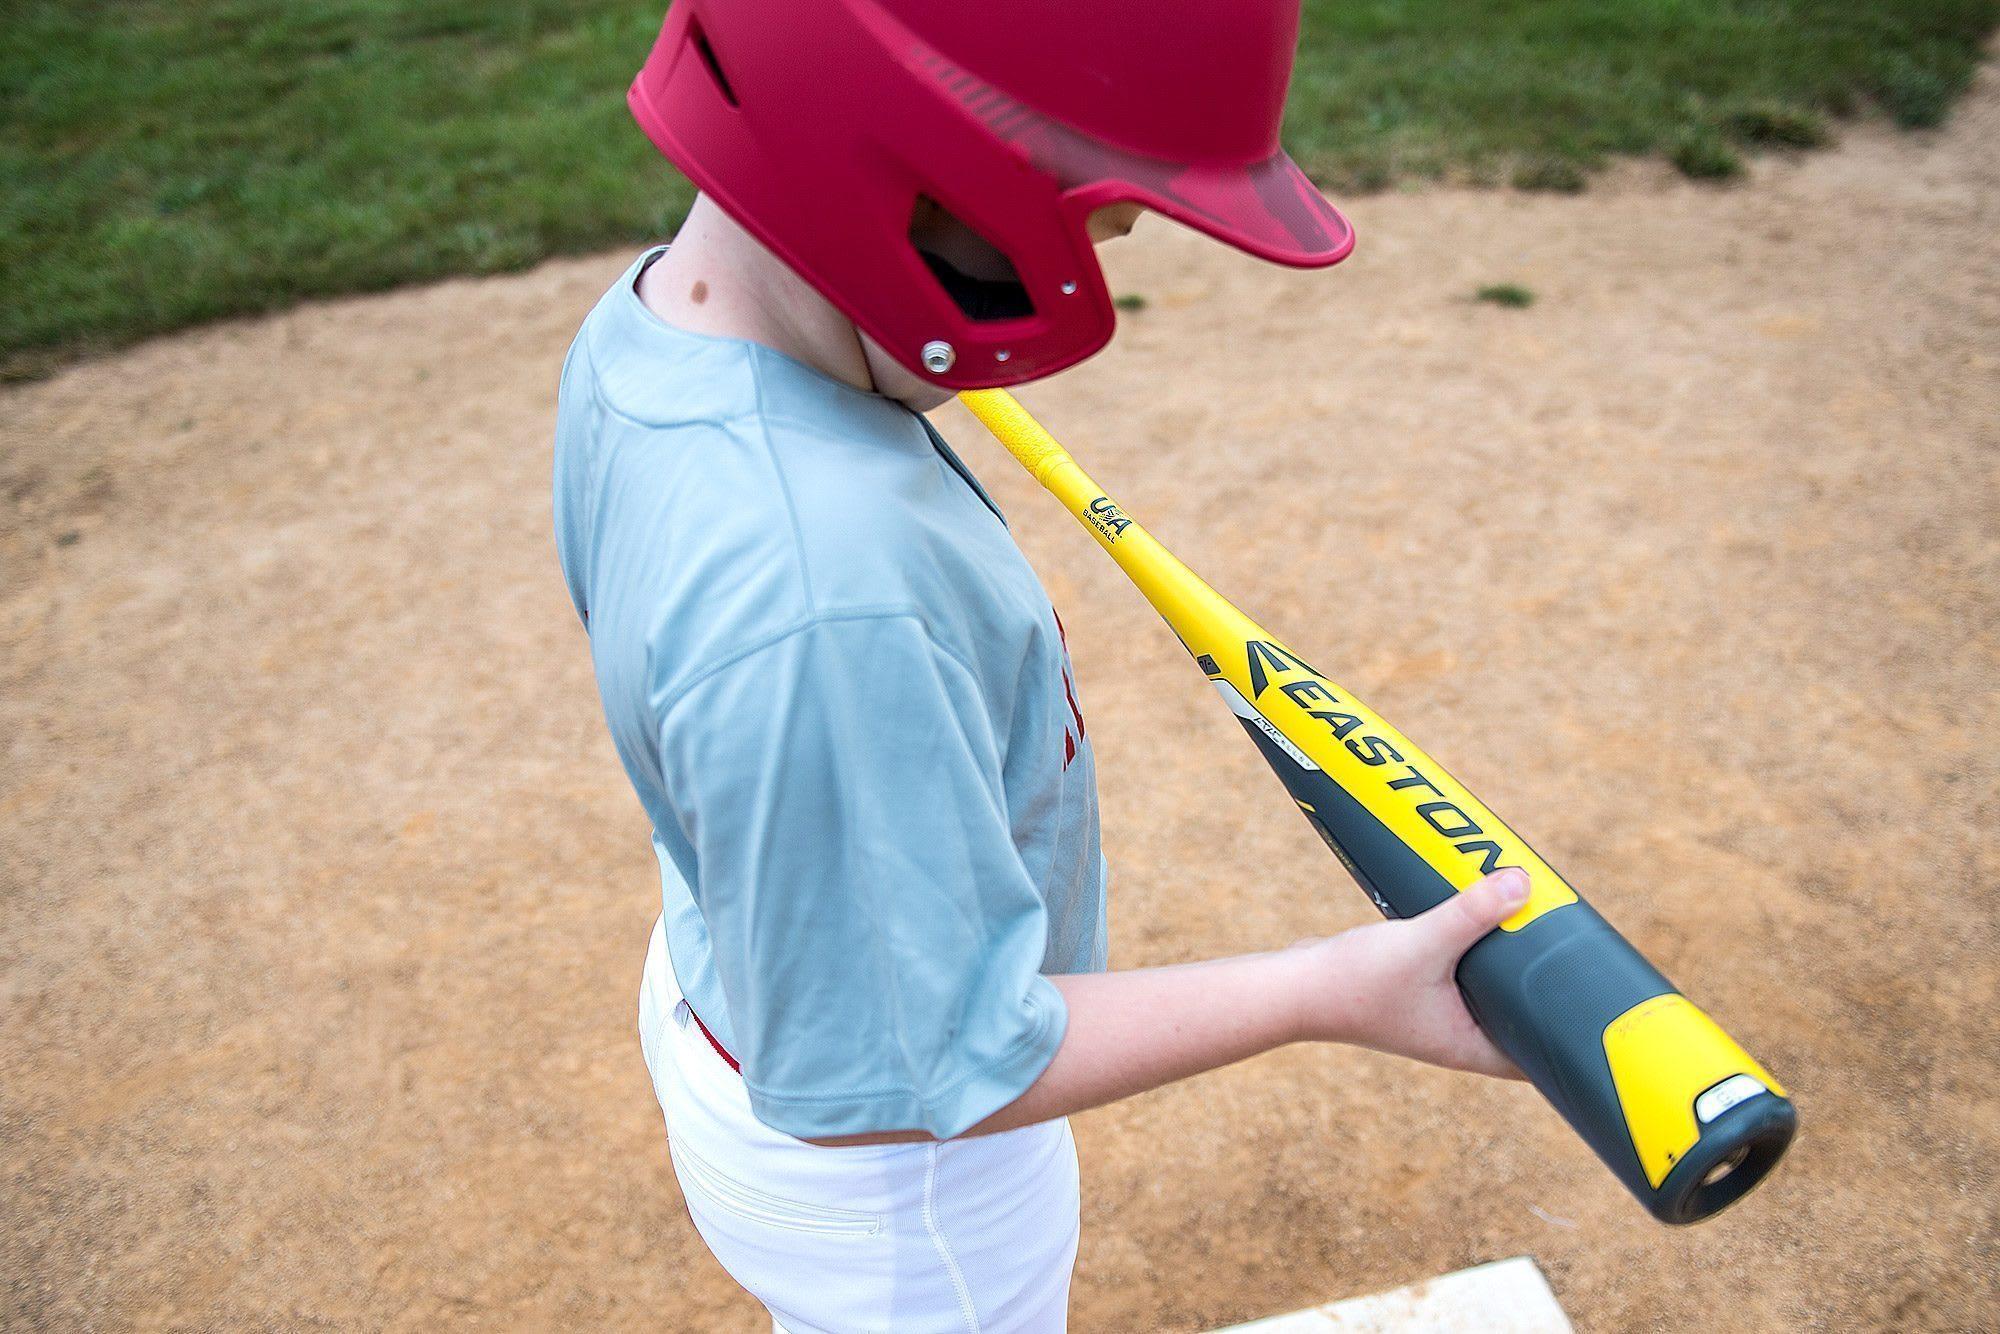 player holding bat